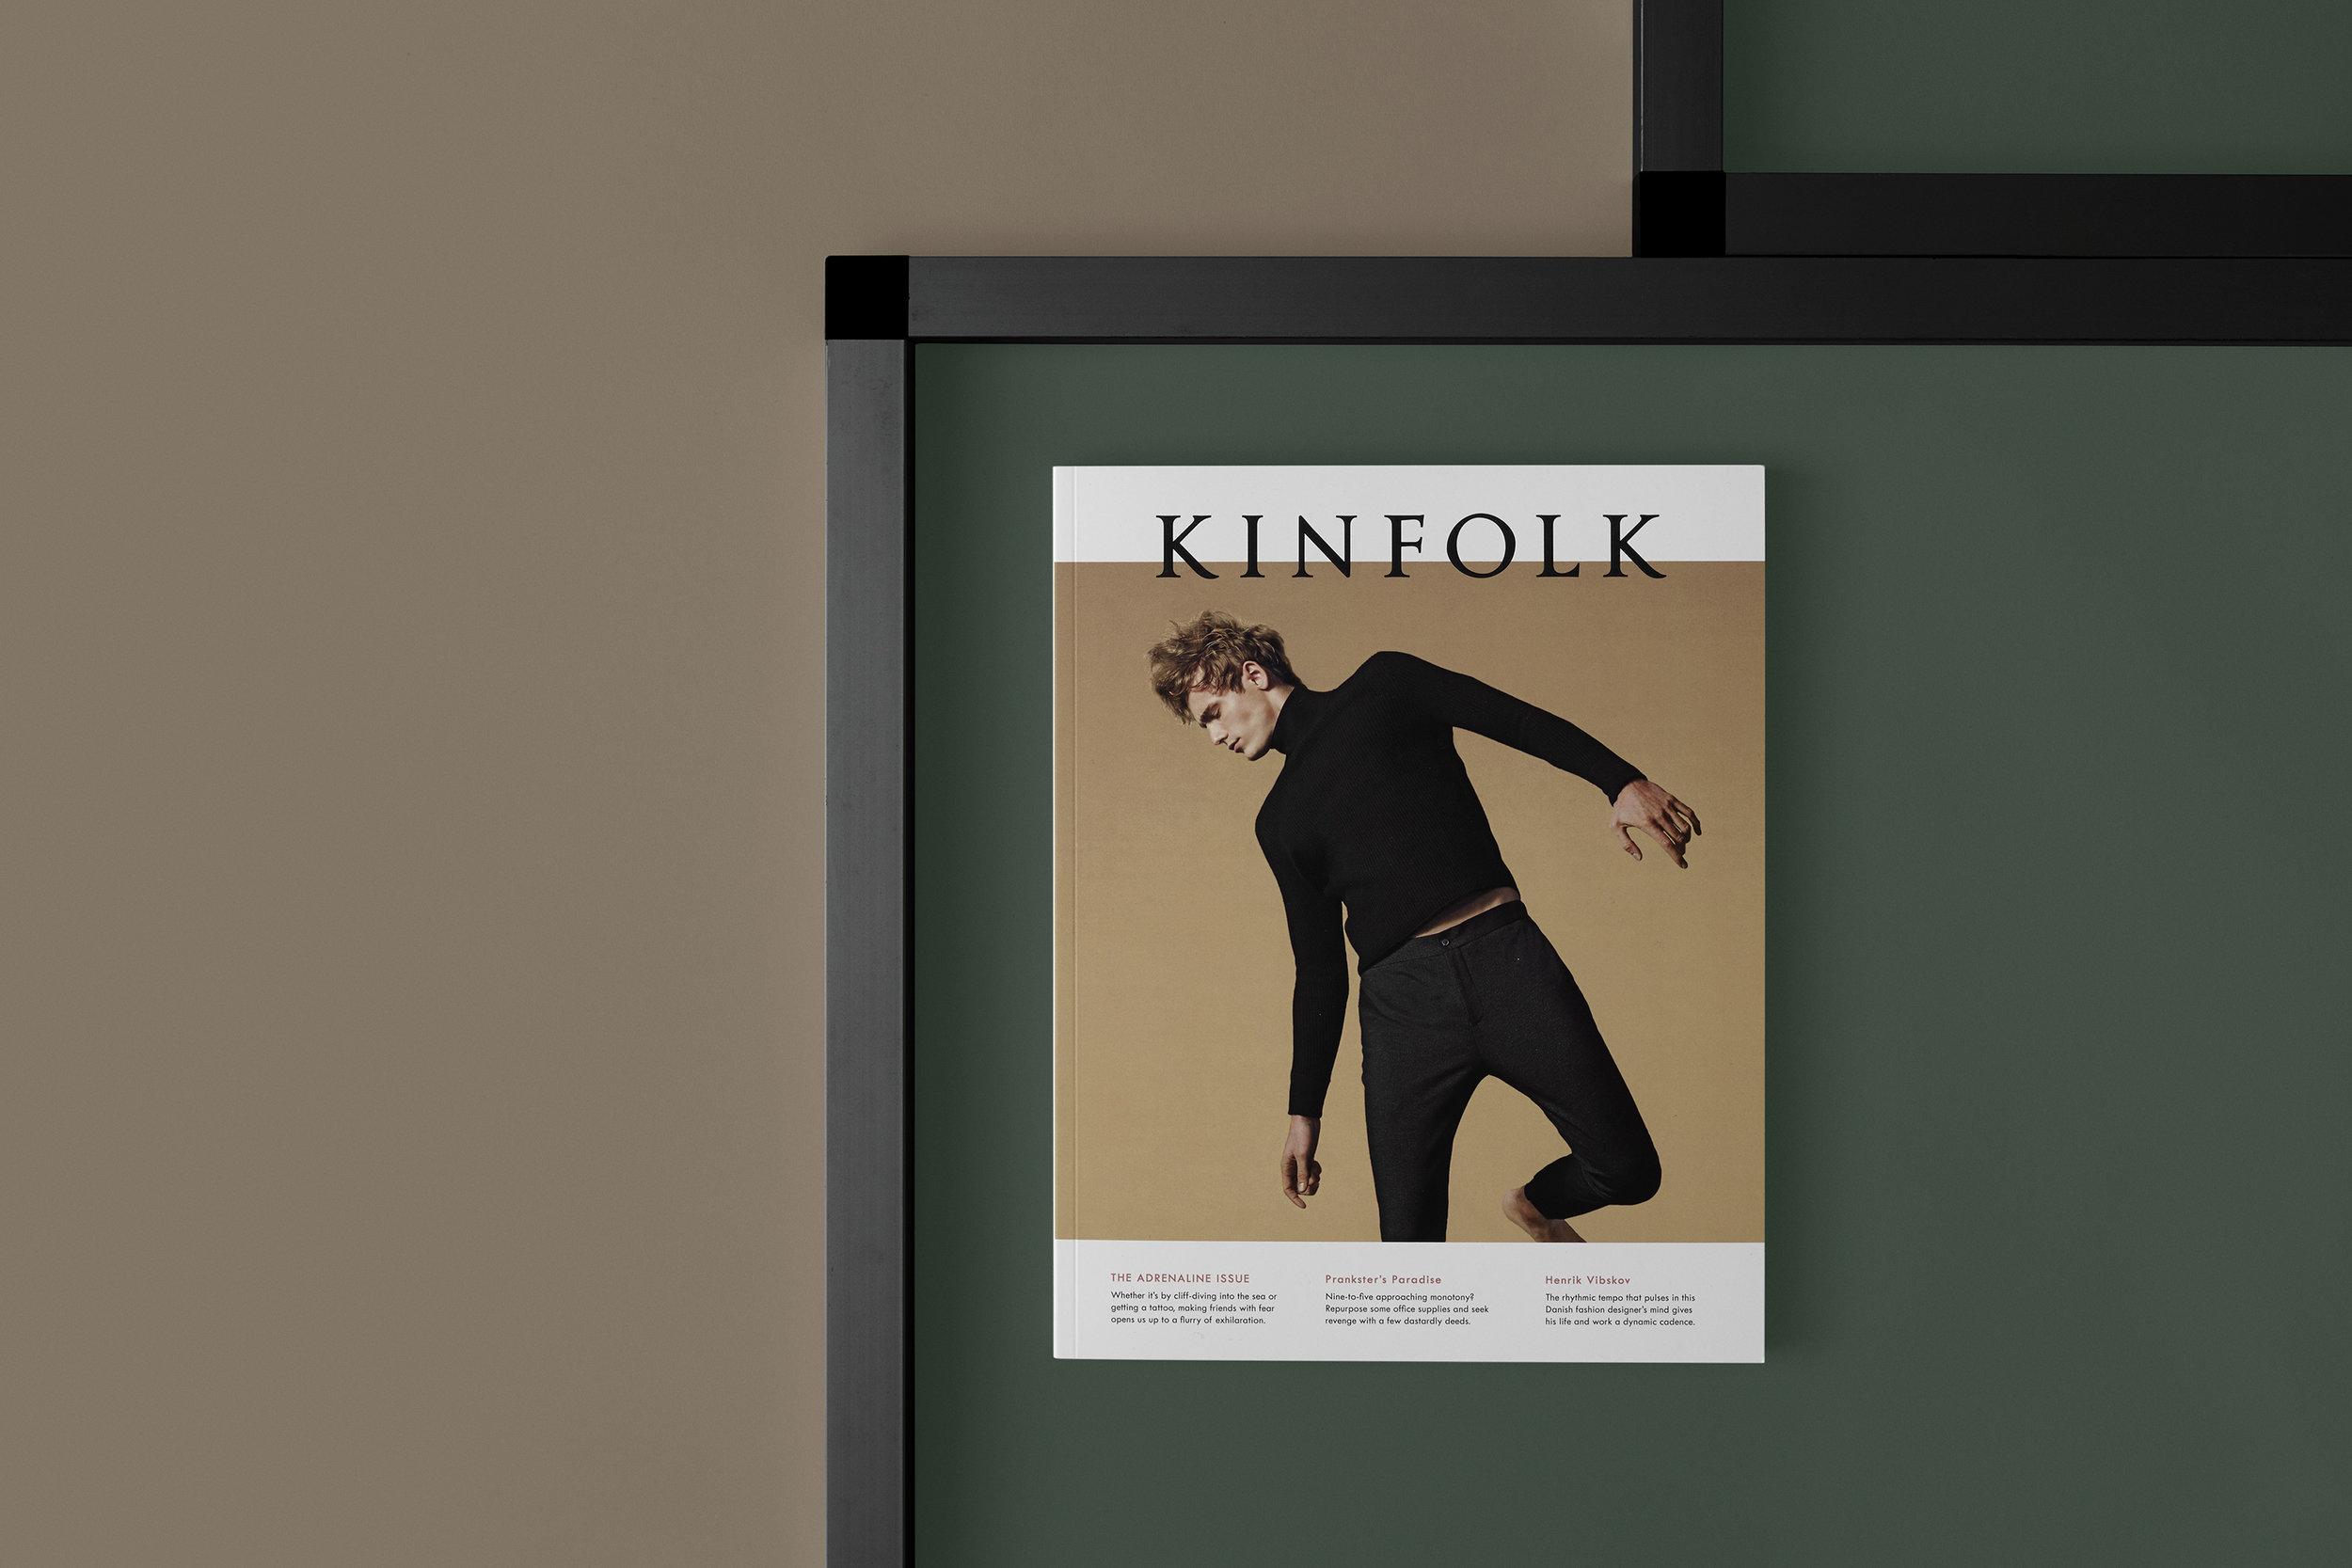 KinfolkPromo_ArtDirection06.jpg